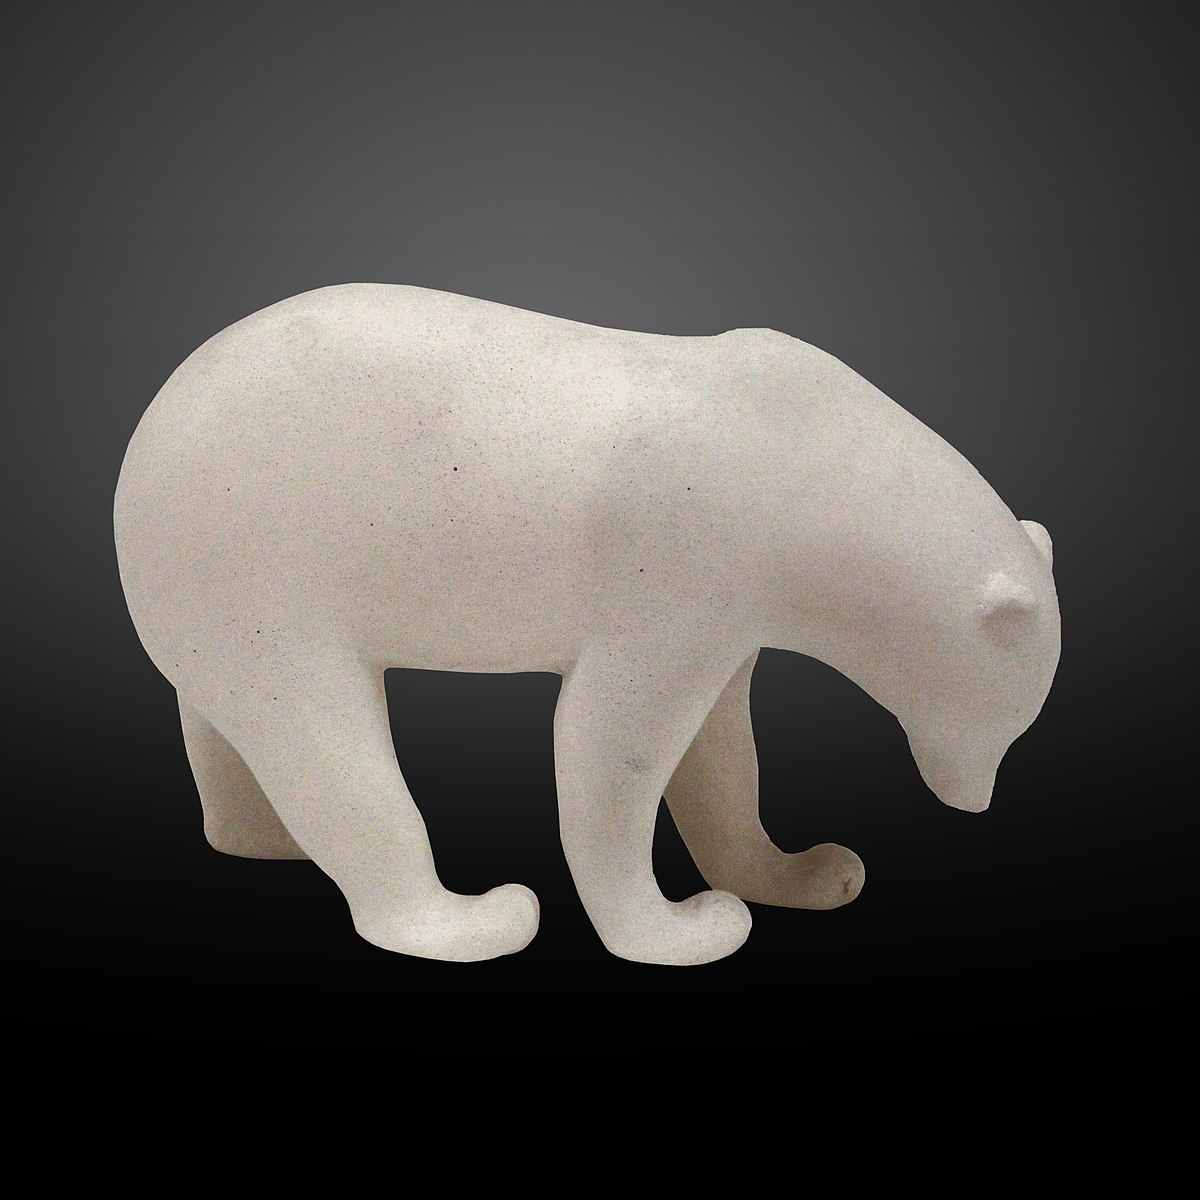 fecc41eeed9 Brown bear - Wikidata